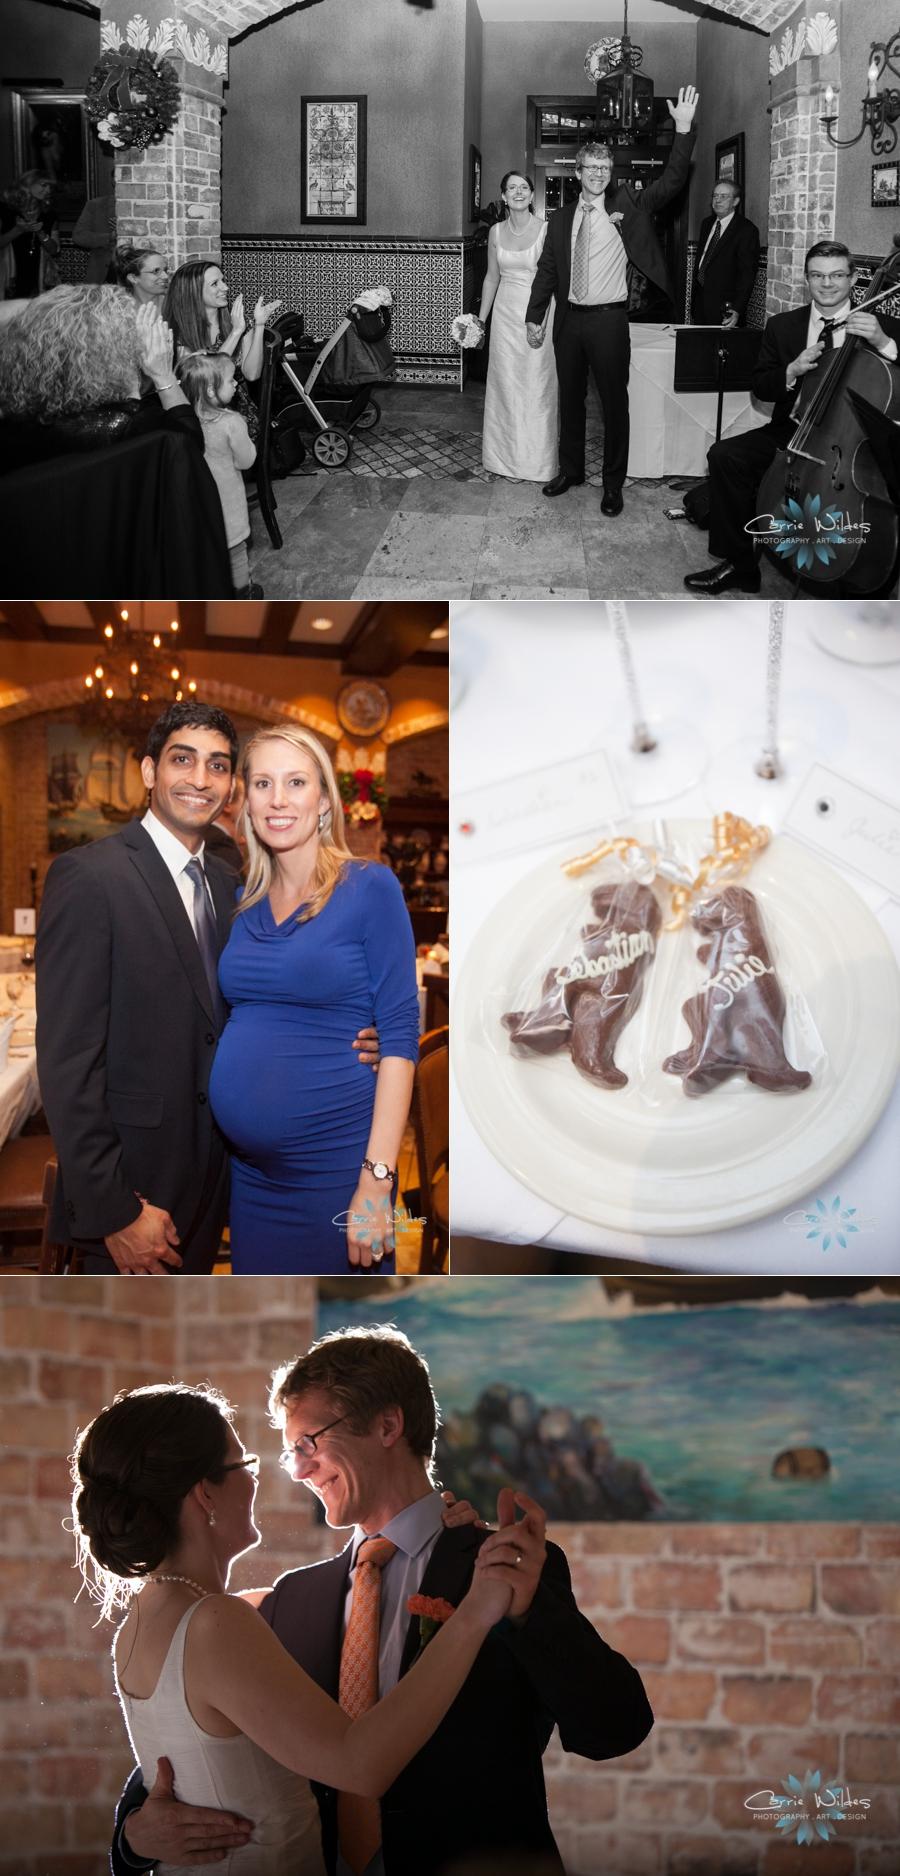 12_27_13 Ybor City Wedding_0007.jpg